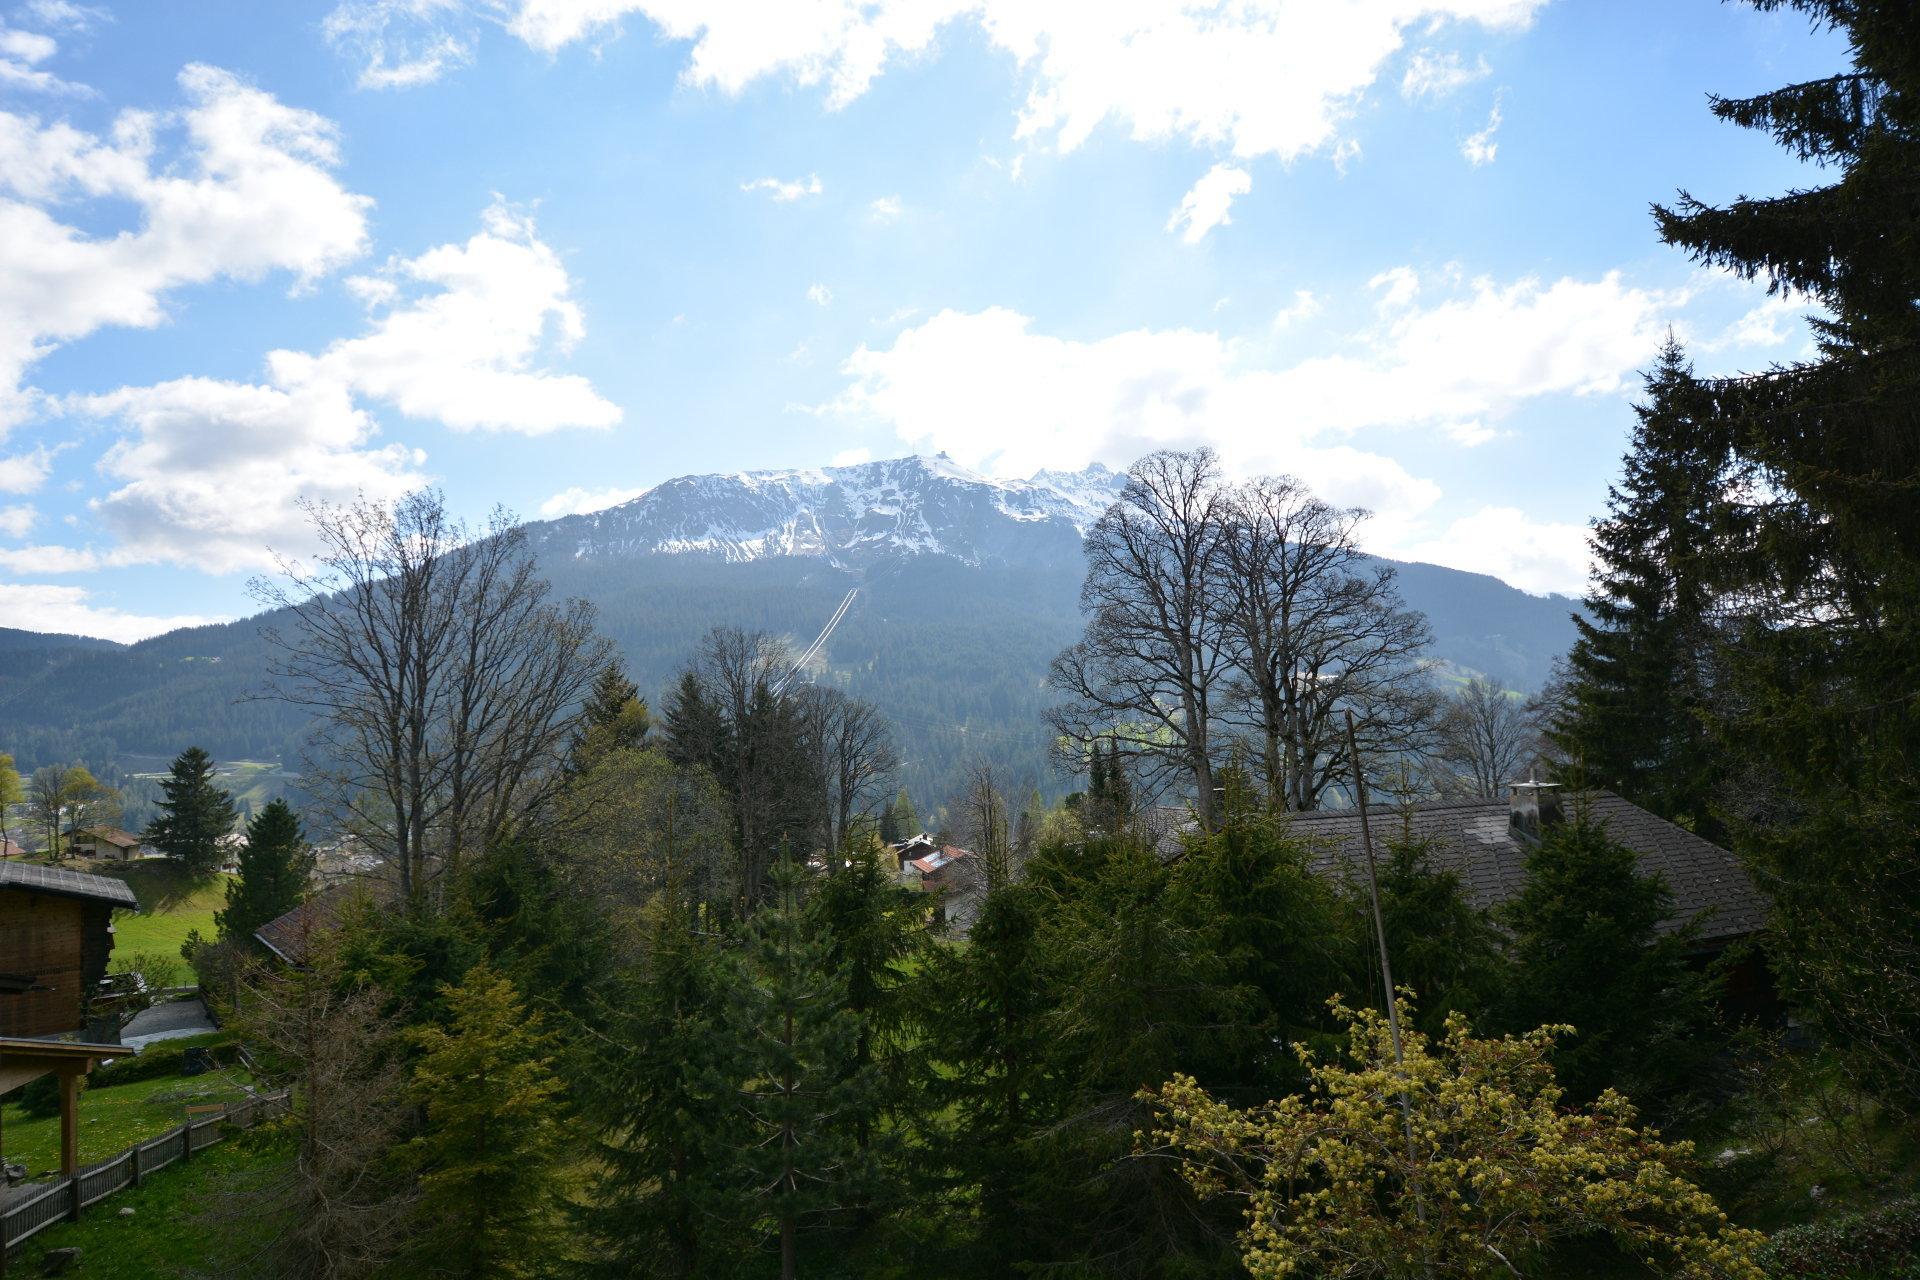 Chalet-Fuechsli-Klosters-Sommer-6.JPG